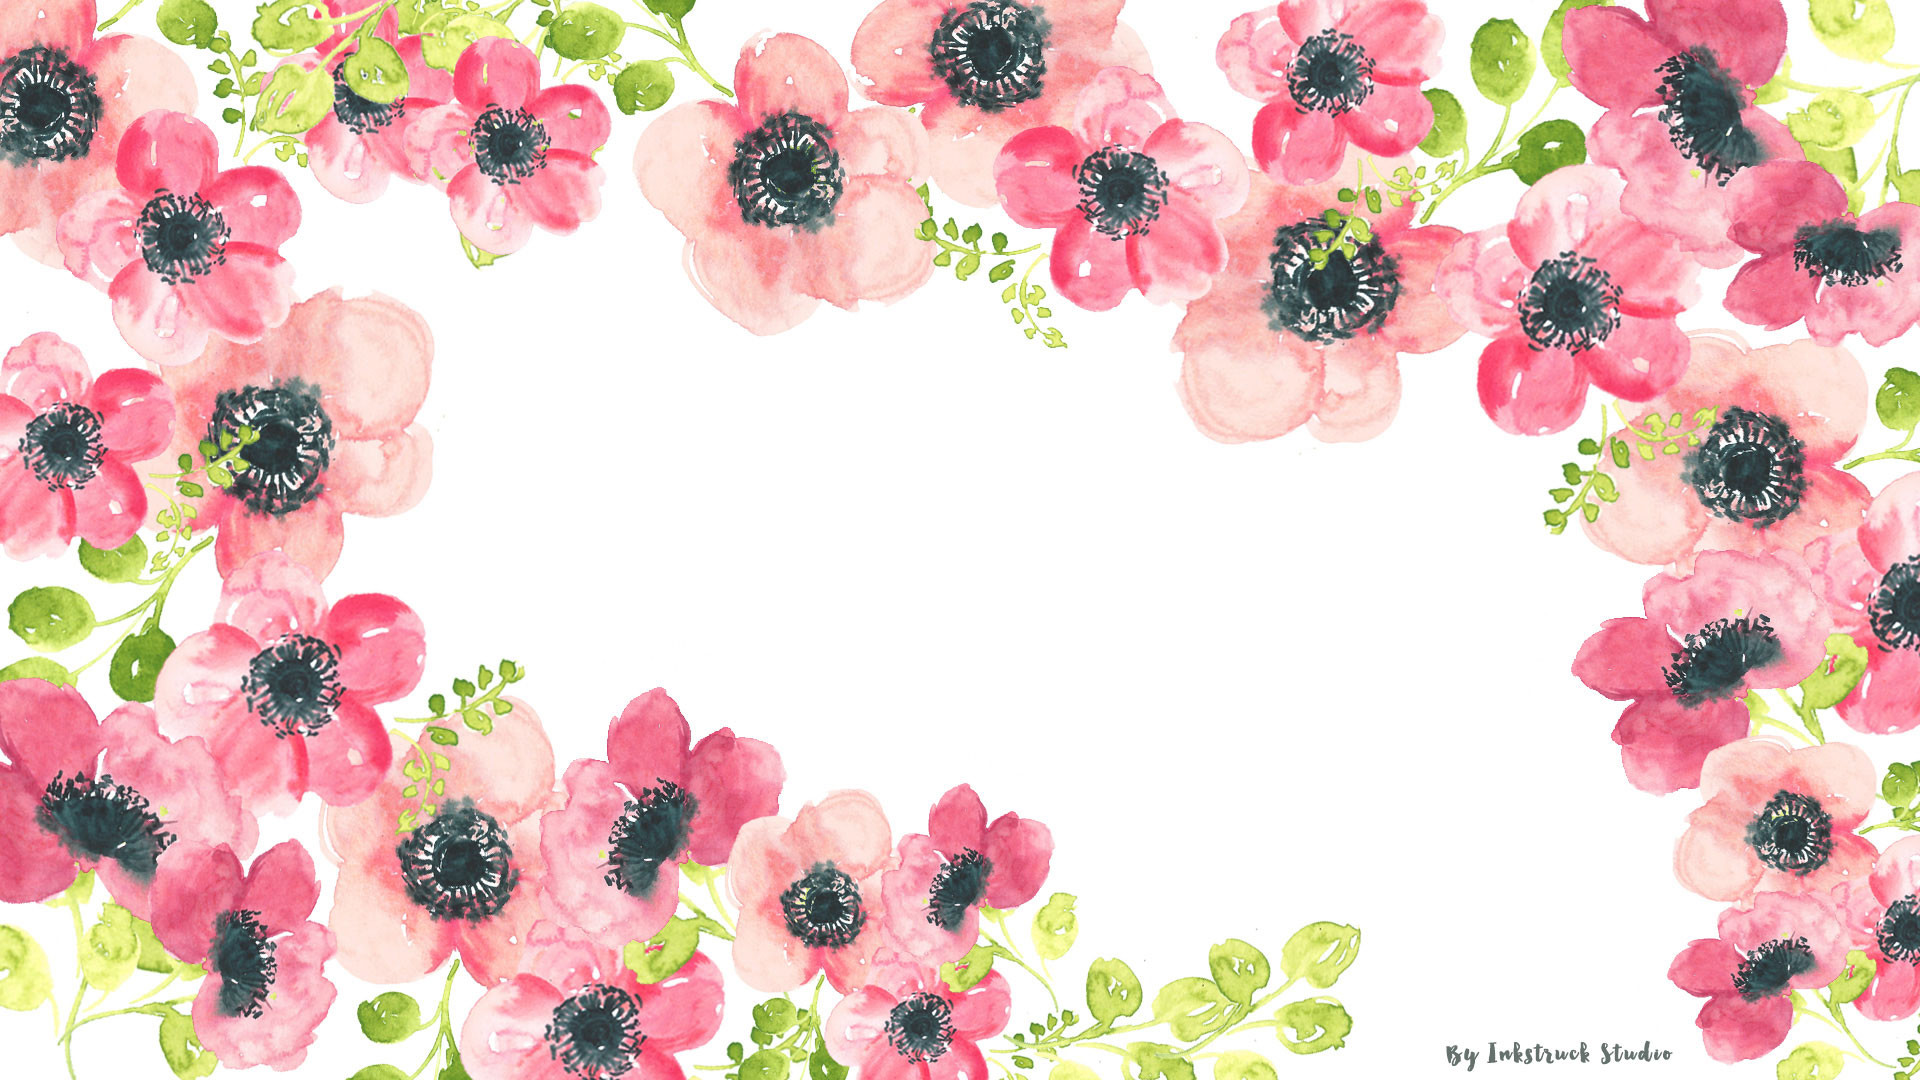 1920x1080 photos stunning attractive feminine 28 hd desktop background wallpaper